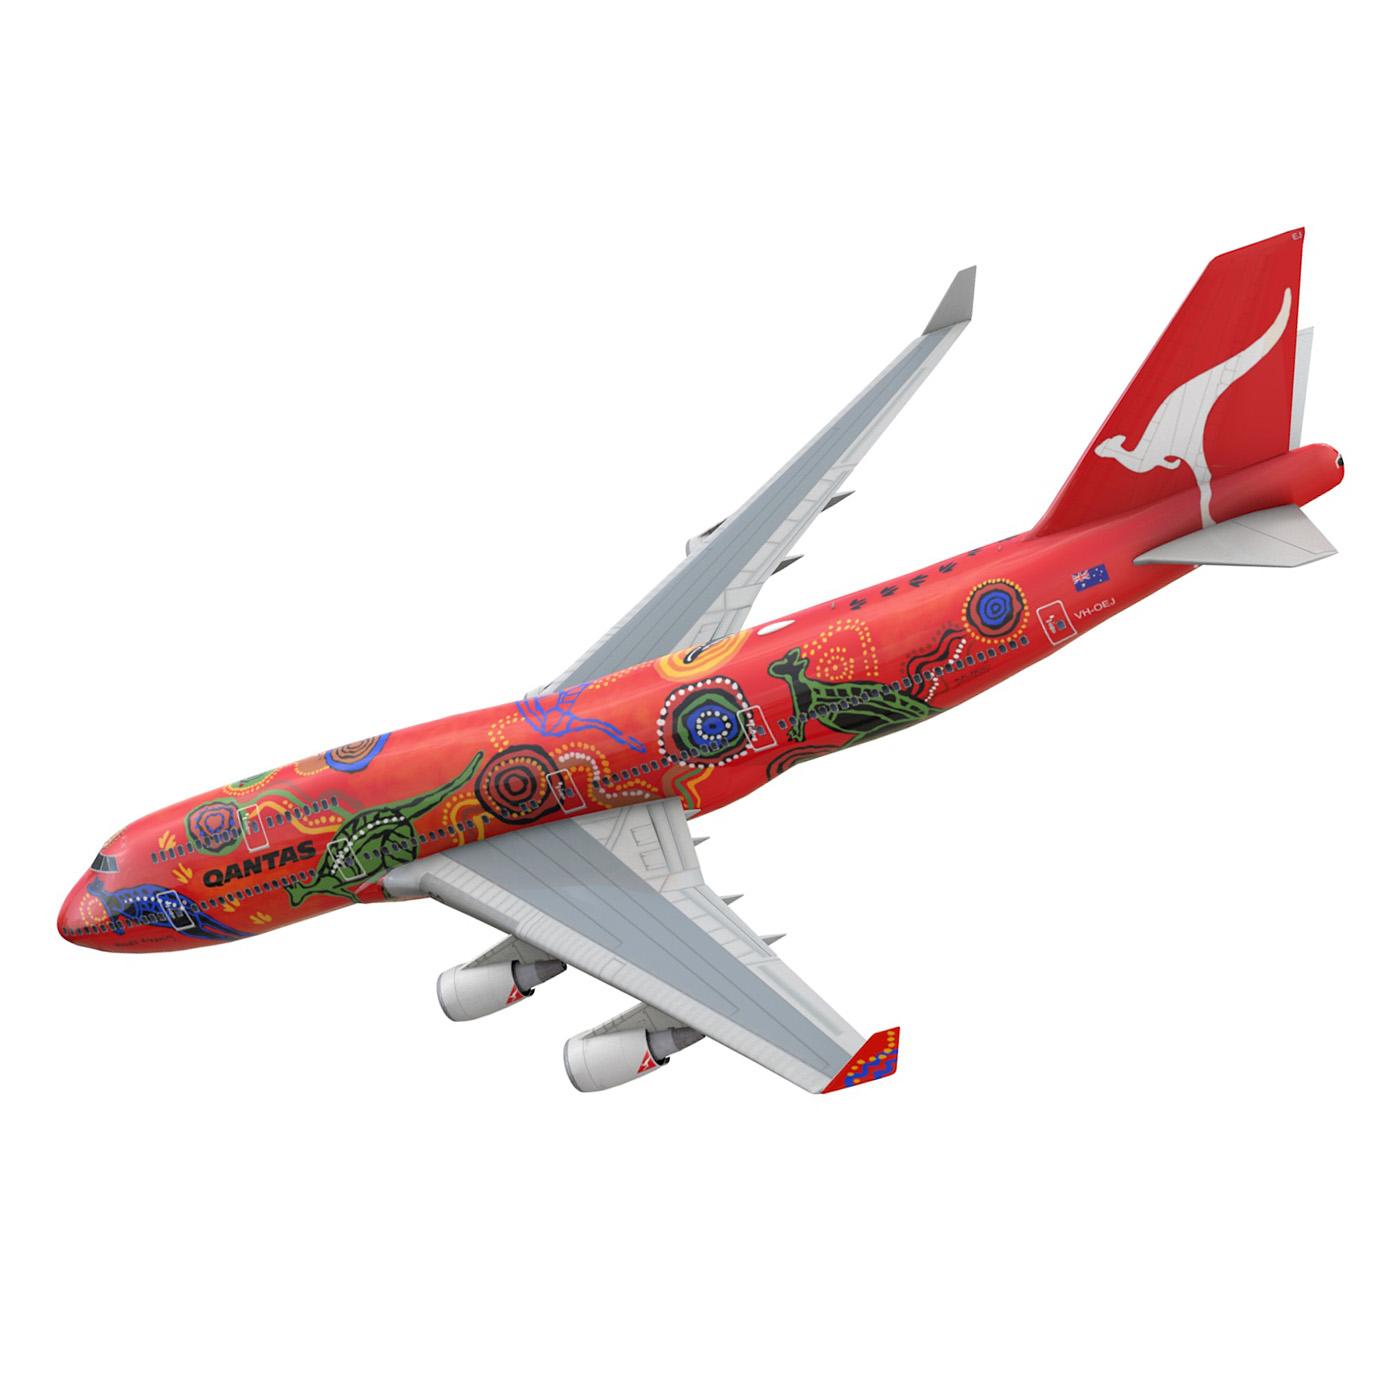 boeing 747 qantas wunala dreaming 3d model 3ds fbx c4d lwo obj 281783